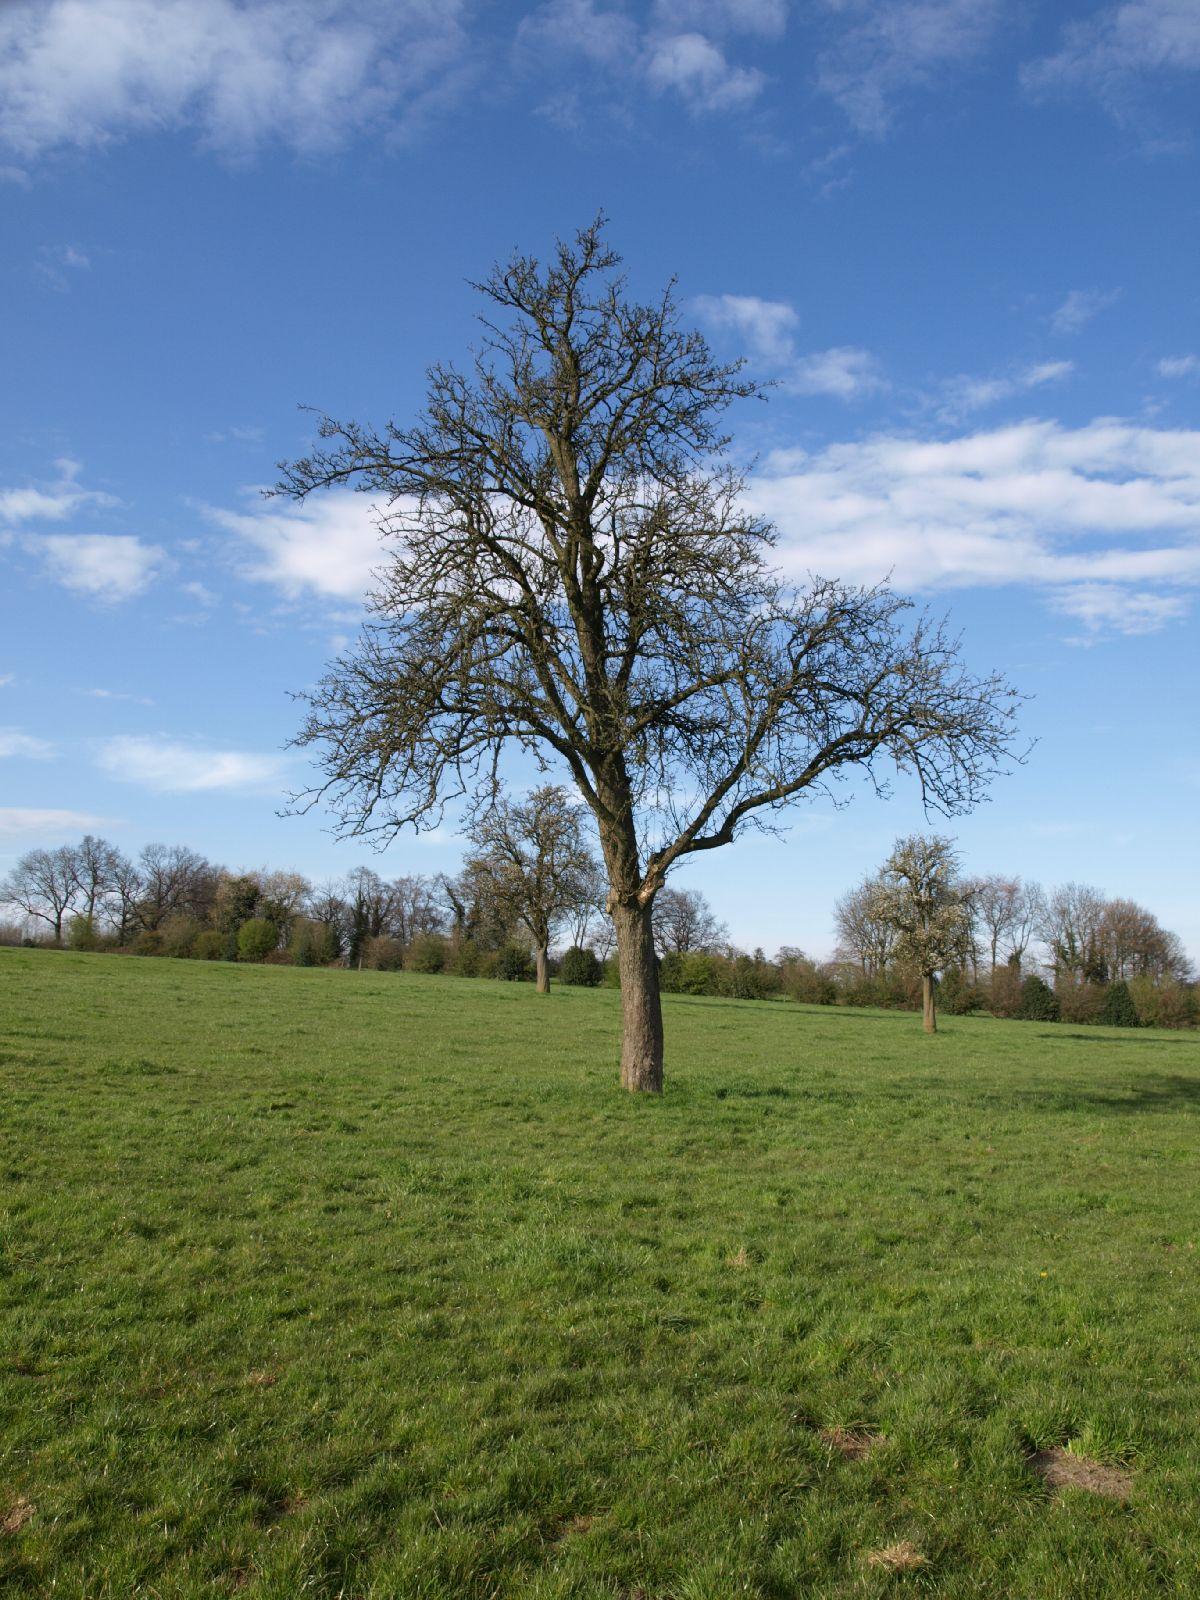 Pflanzen-Baum-Silhouette-Foto_Textur_B_P4201557